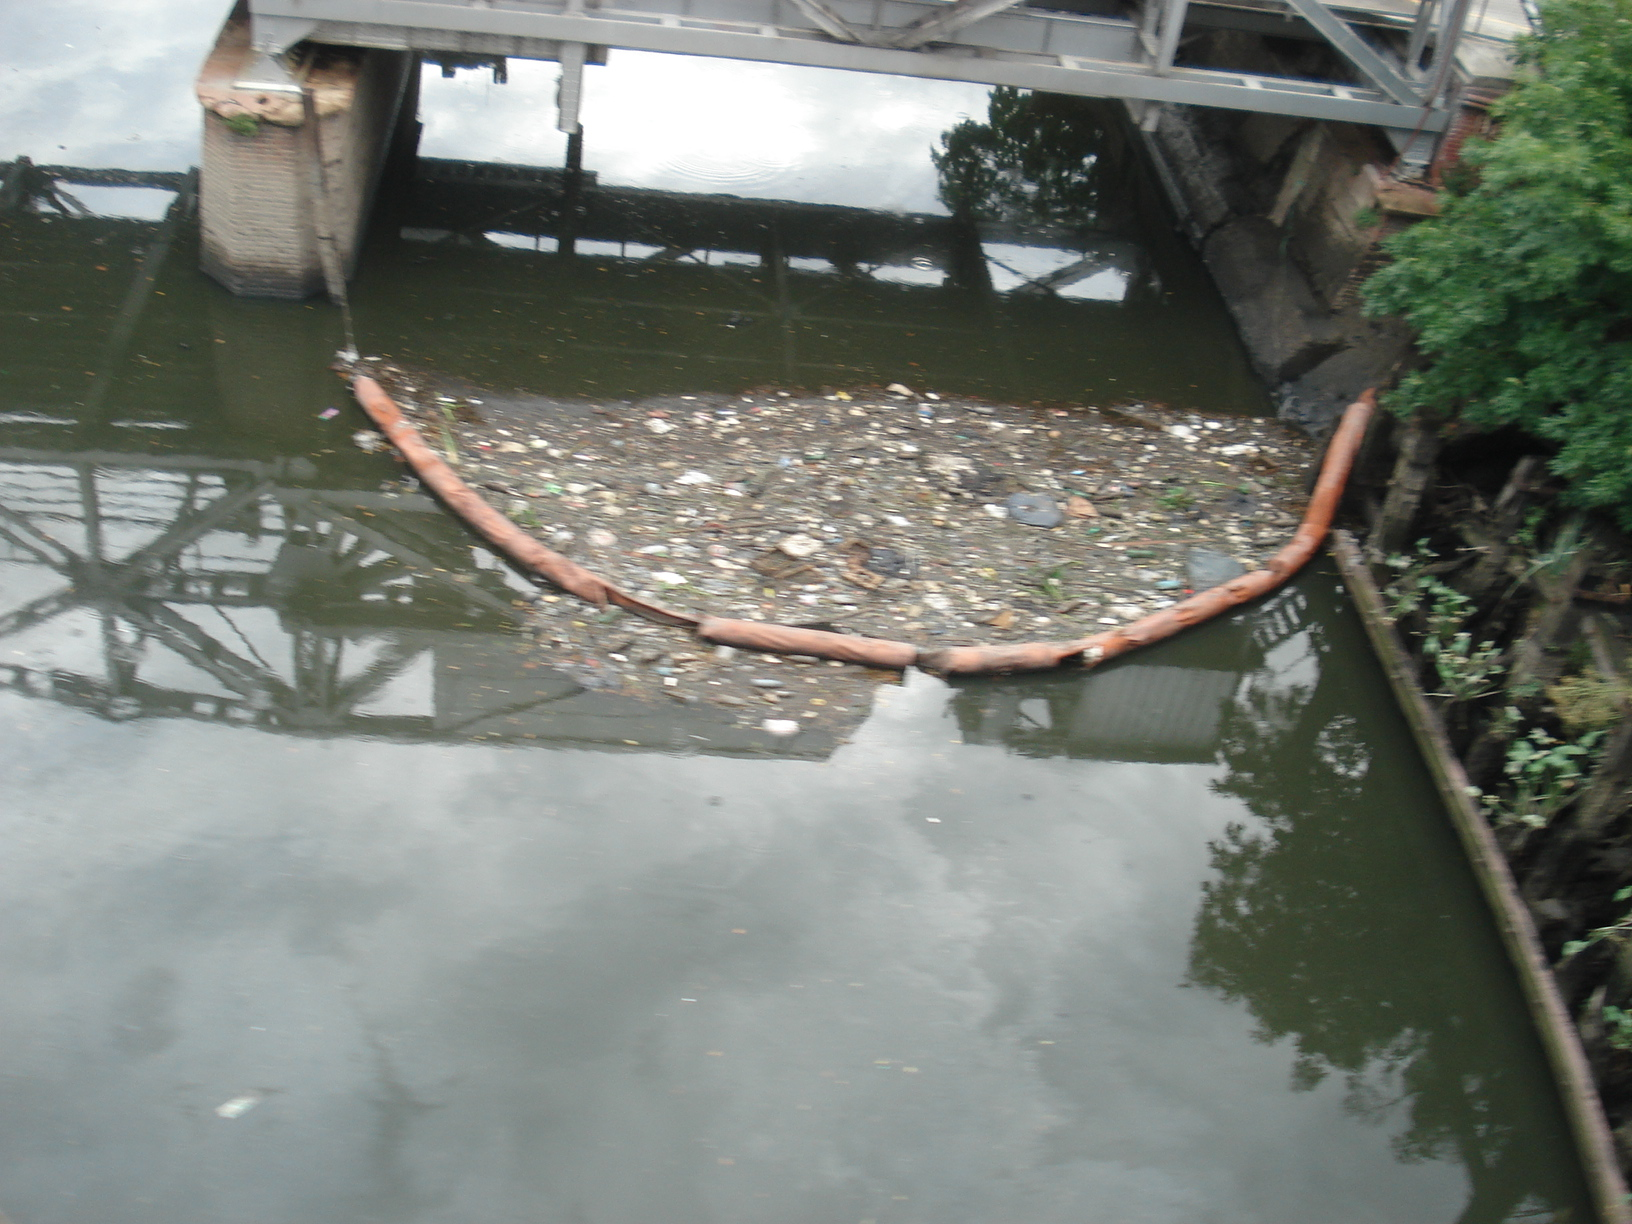 Basura flotante desborda a diario sobre la manguera extendida para evitarlo aun sin corriente.